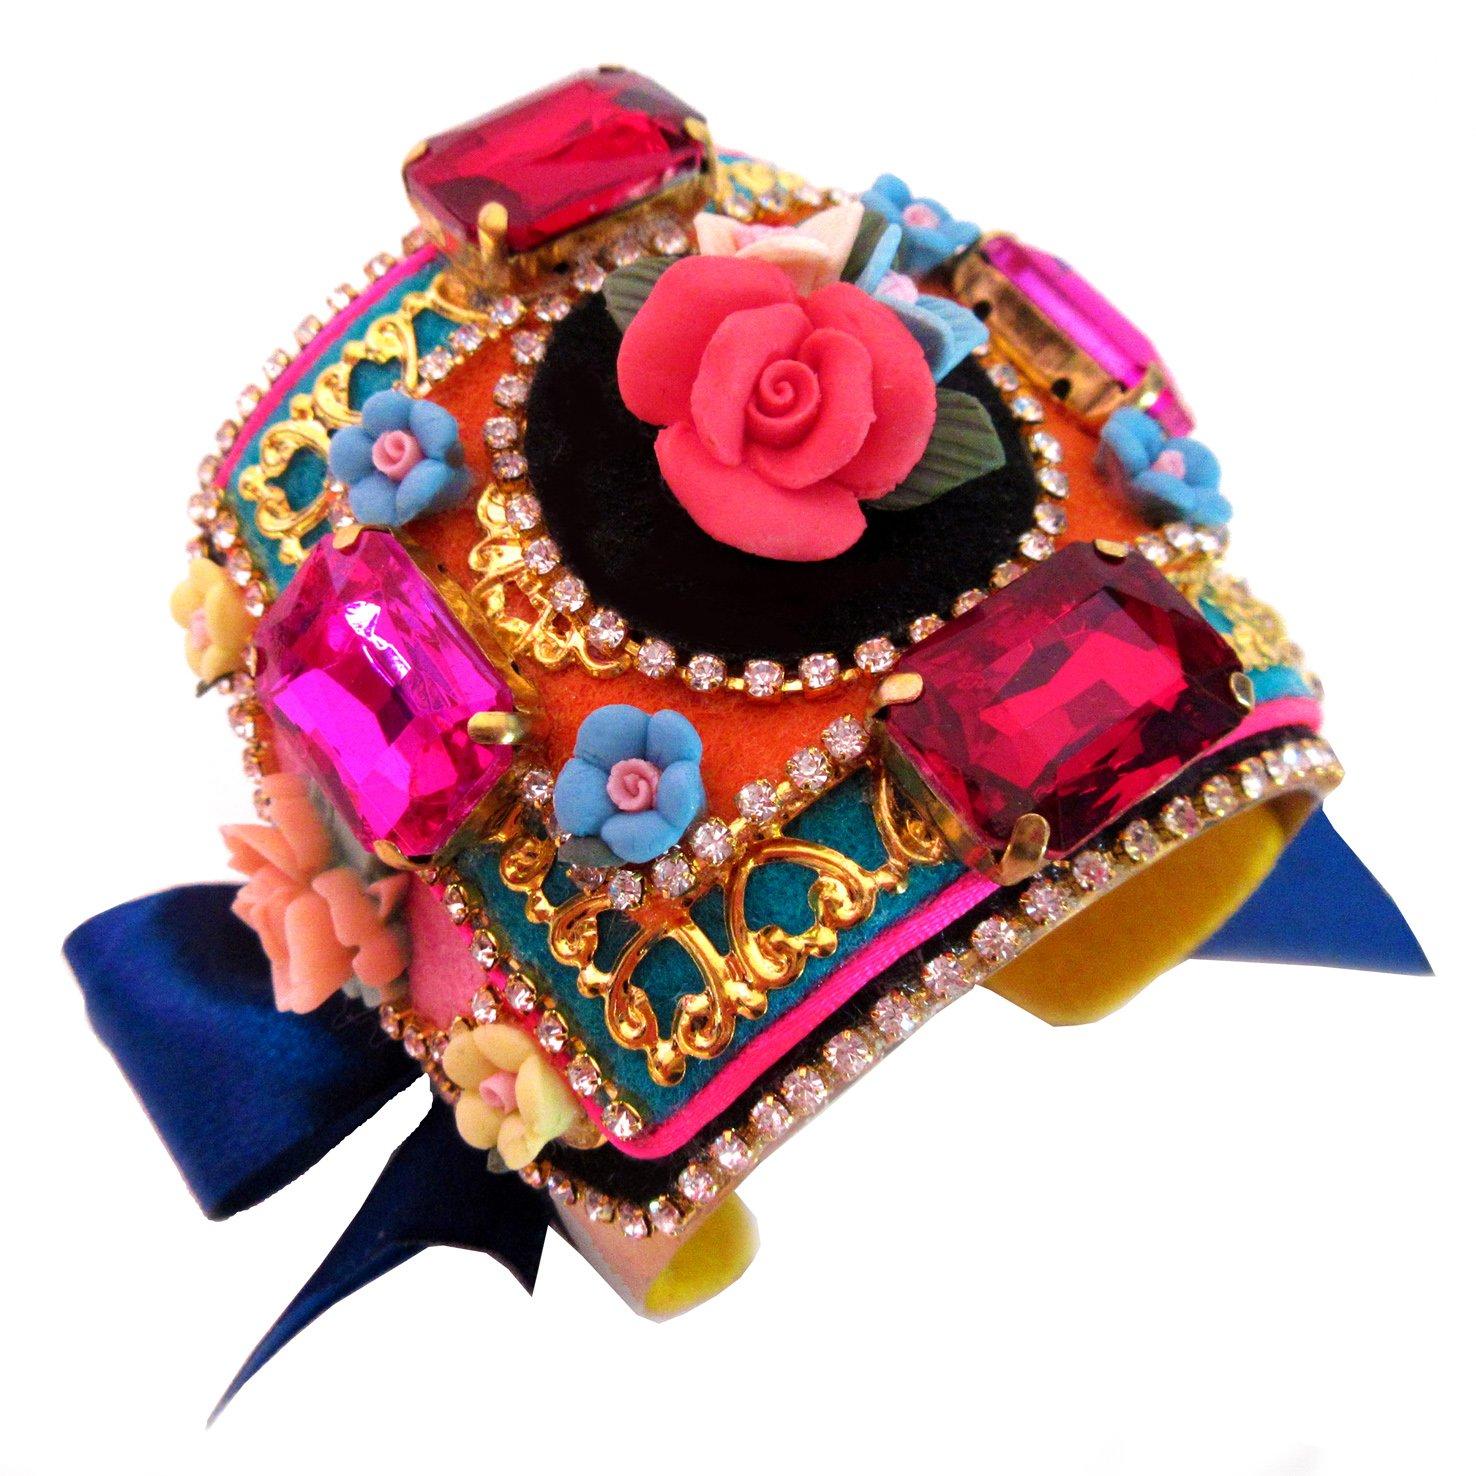 mouchkine-jewelry-bracelet-mode-fashion-tendance-trend-manchette-bijoux-jewels-couture-hautecouture-chic-magical-edge.jpg